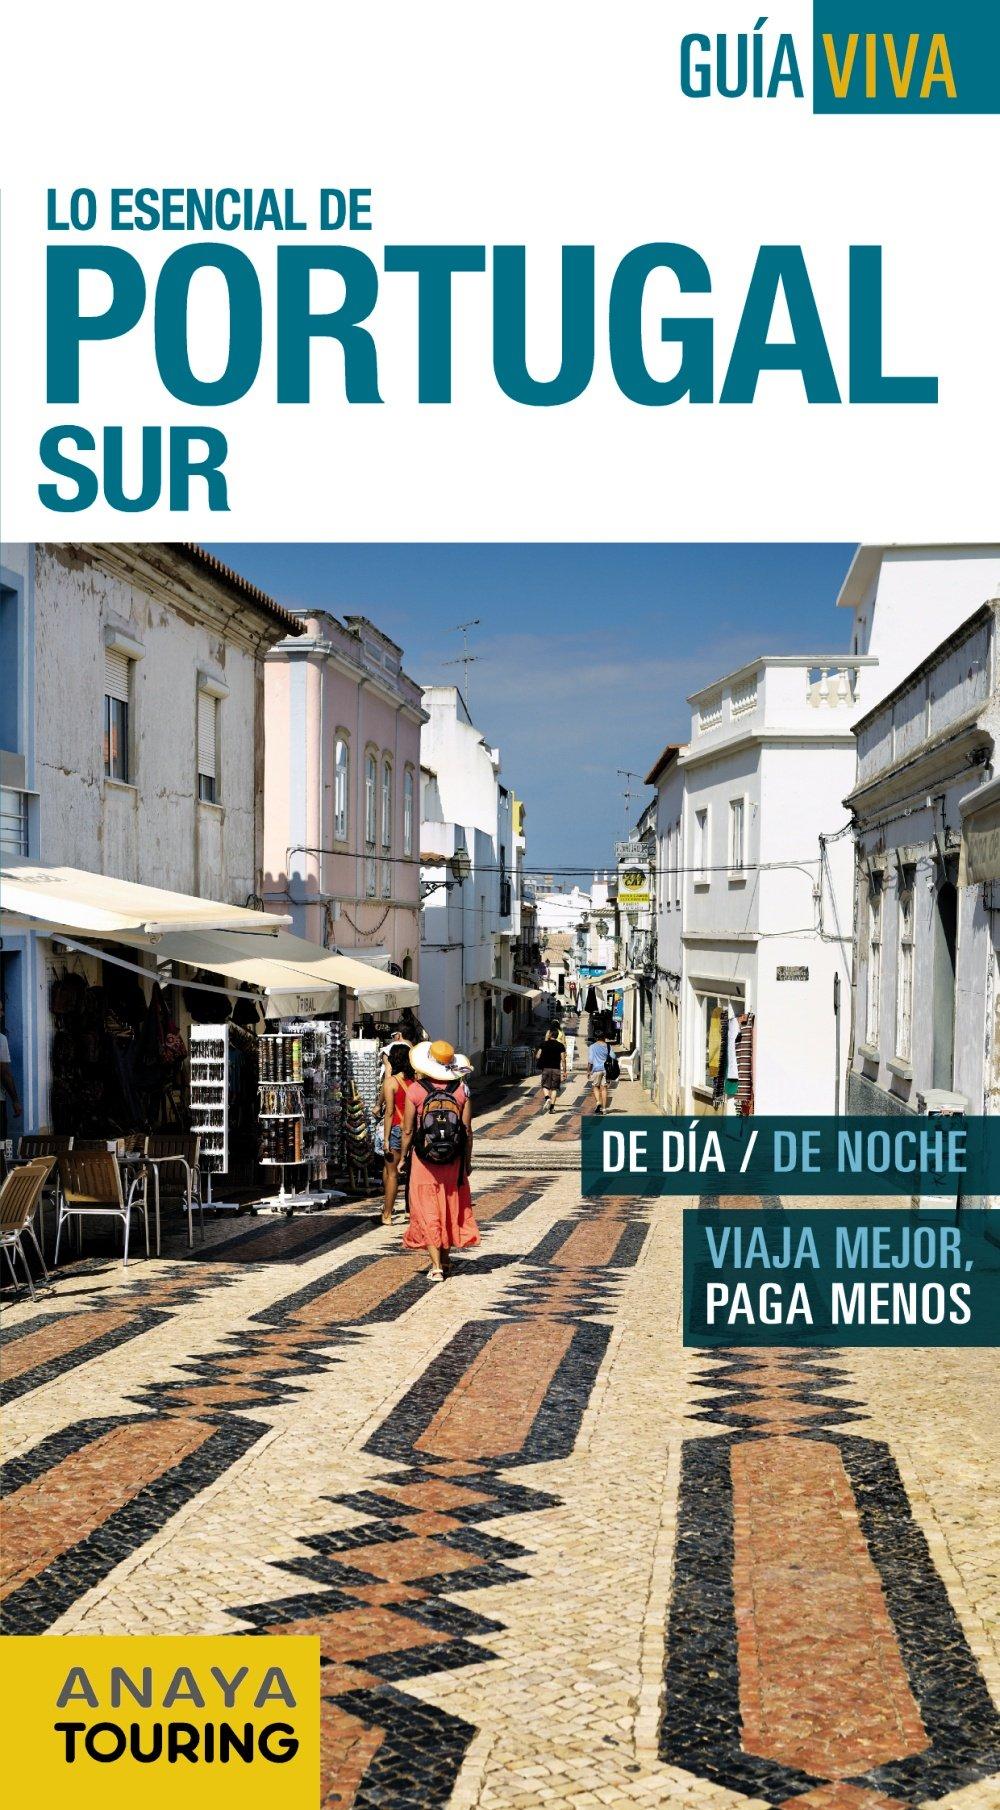 Portugal Sur (Guía Viva - Internacional): Amazon.es: Pombo ...